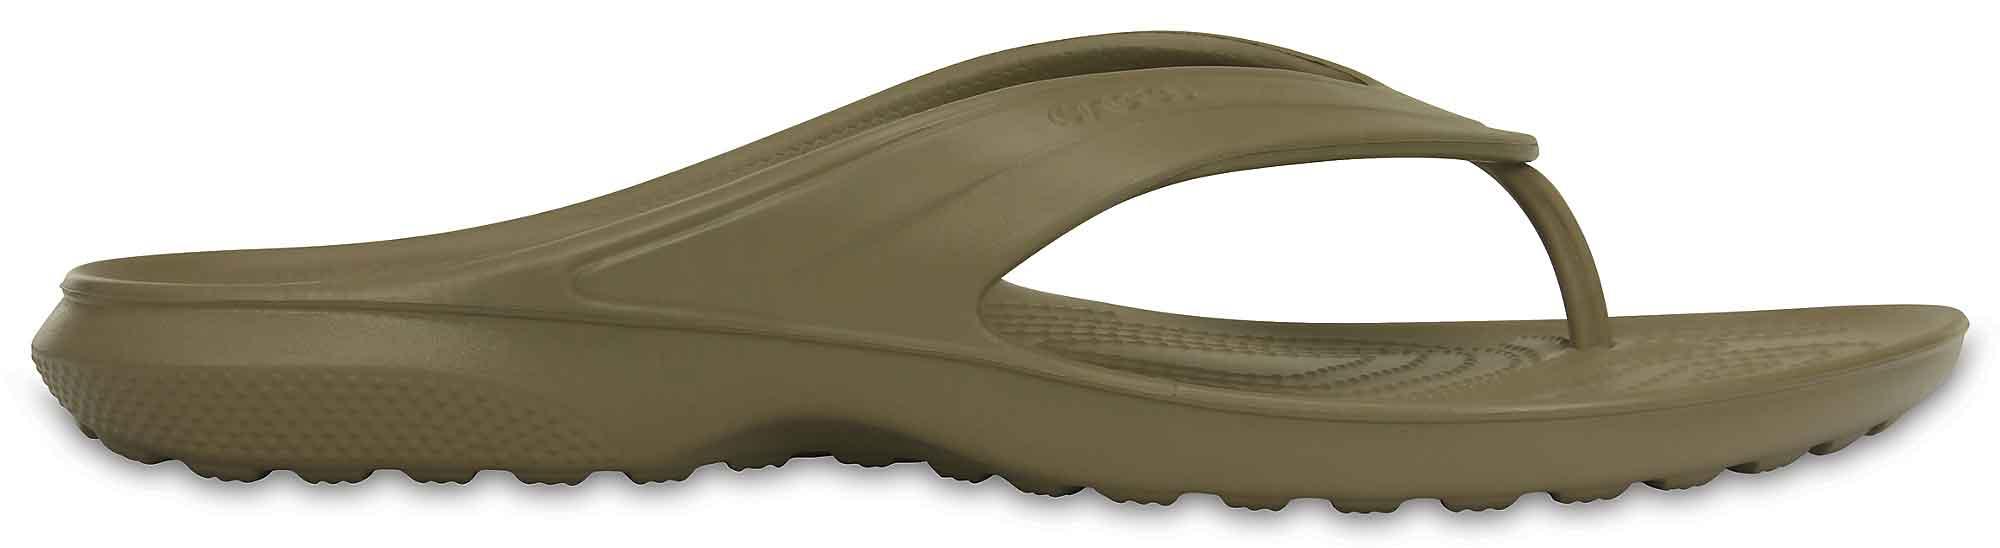 5873b610a525 Crocs Classic Flip (Khaki)